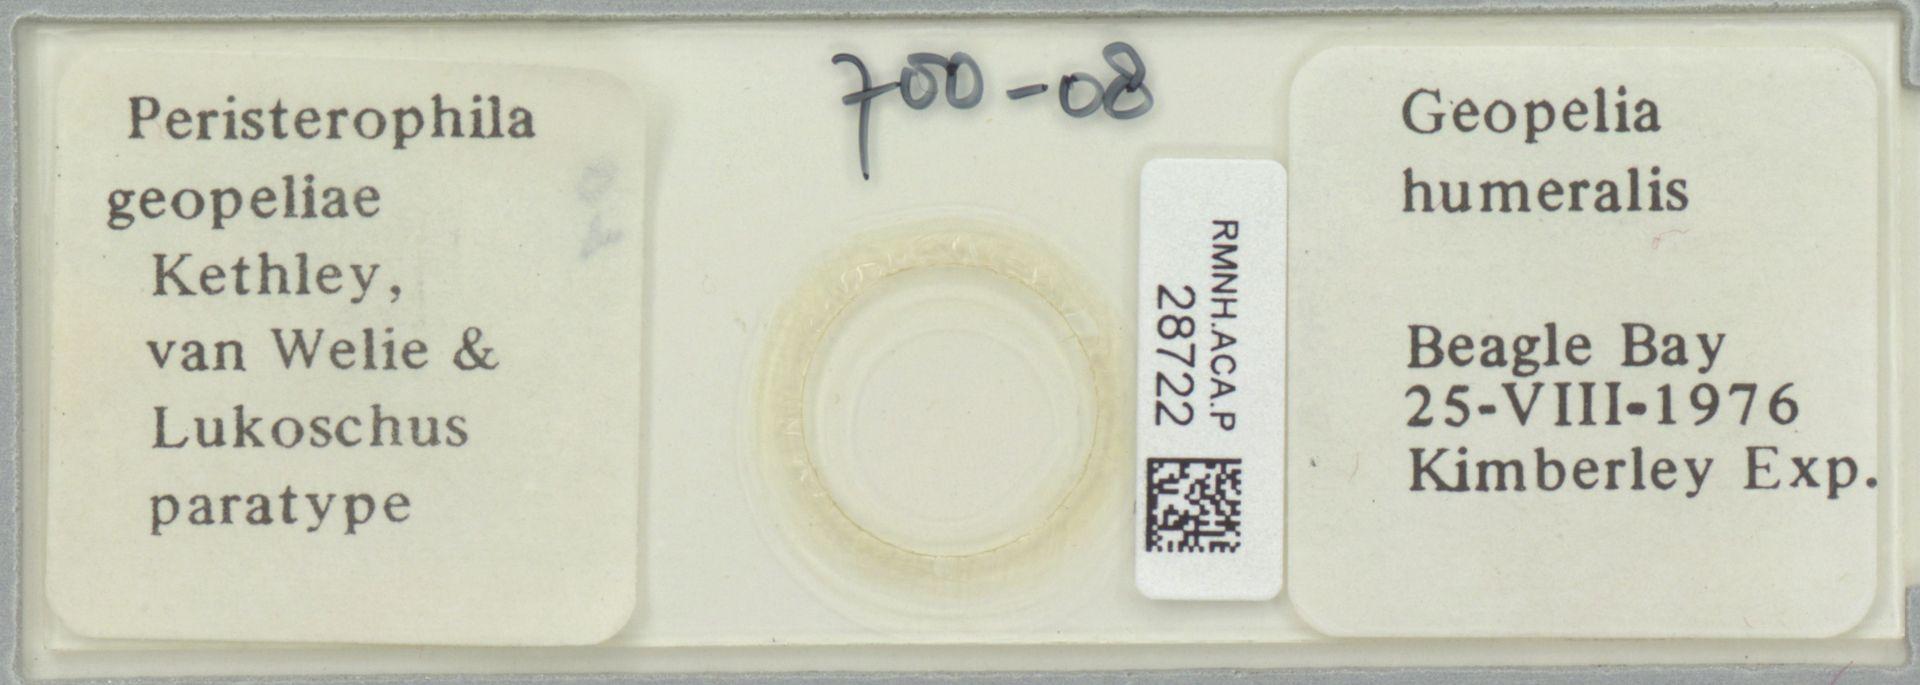 RMNH.ACA.P.28722   Peristerophila geopeliae Kethley, van Welie & Lukoschus